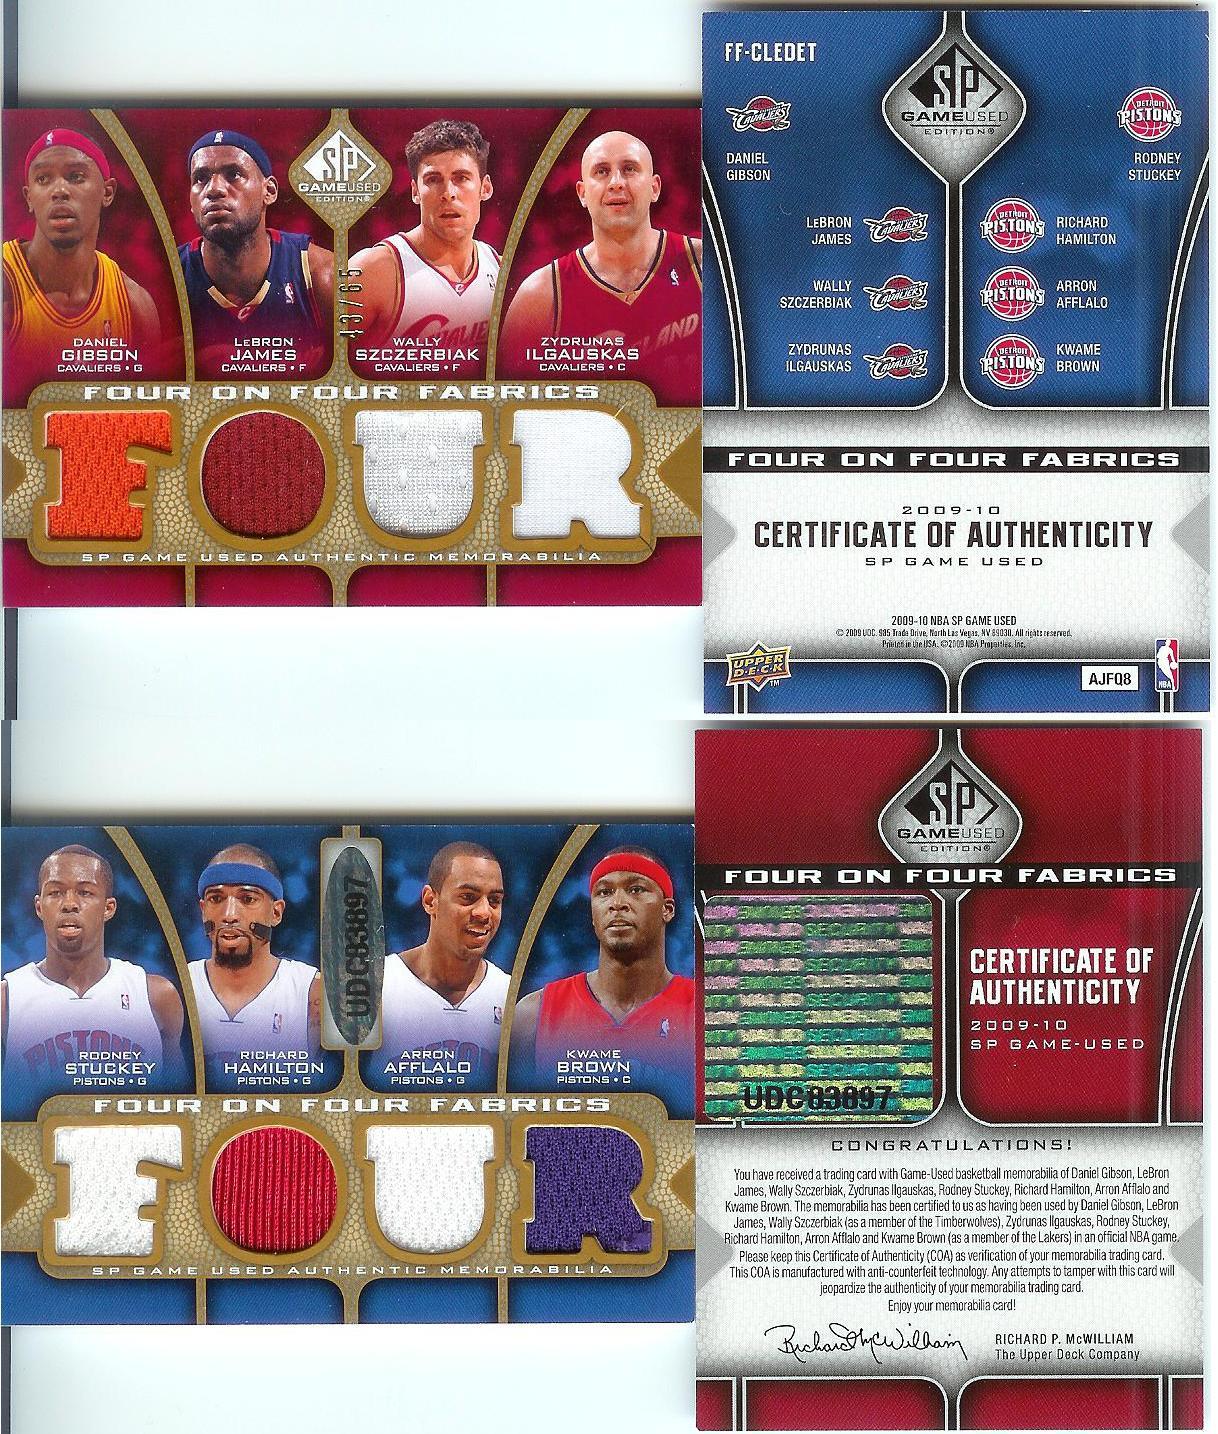 2009-10 SP Game Used 4 on 4 Fabrics 65 #FFCLEDET Rodney Stuckey/Arron Afflalo/Kwame Brown/Richard Hamilton/LeBron James/Wally Szczerbiak/Zydrunas Ilgauskas/Daniel Gibson